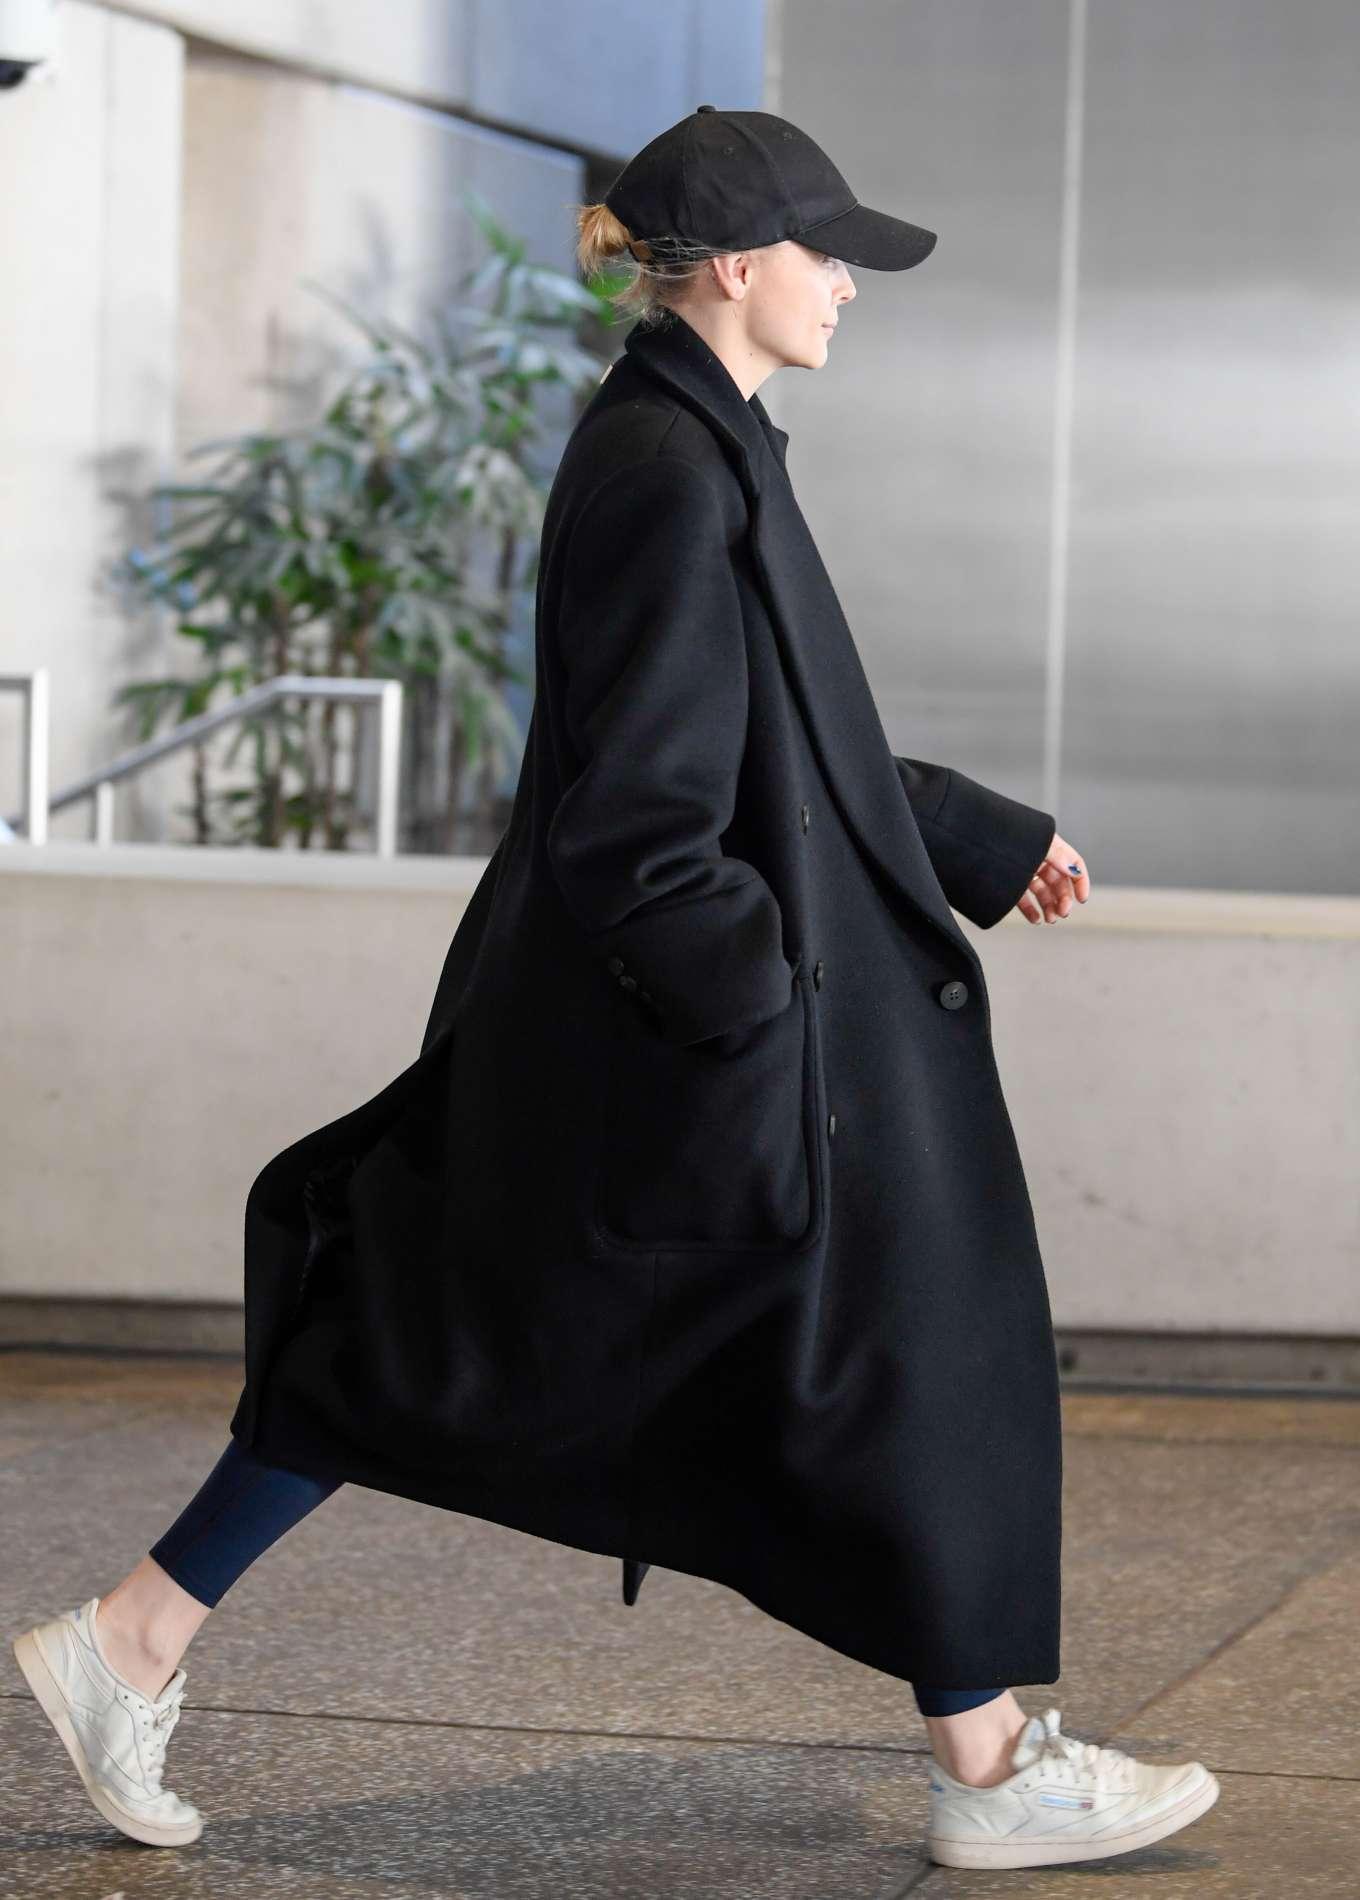 Chloe Grace Moretz 2019 : Chloe Grace Moretz – arriving to Los Angeles International Airport-06